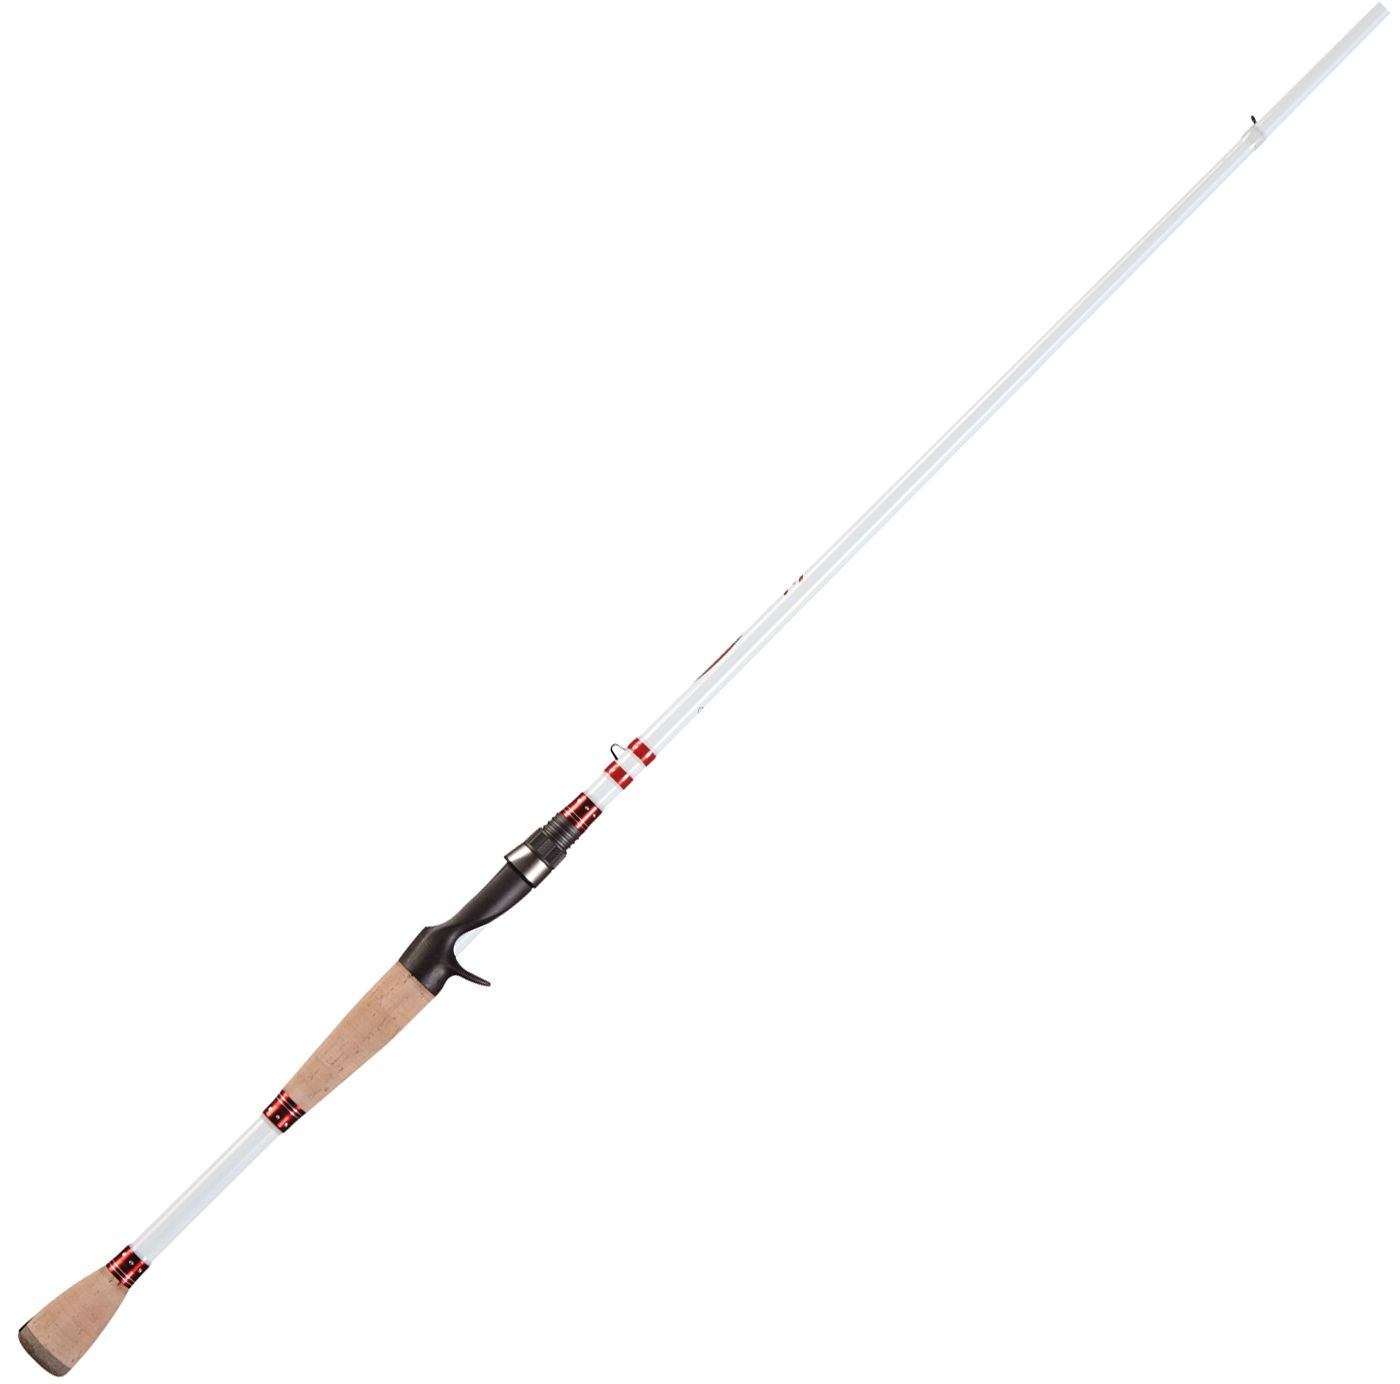 Duckett Fishing Micro Magic Pro Crankin' Casting Rod